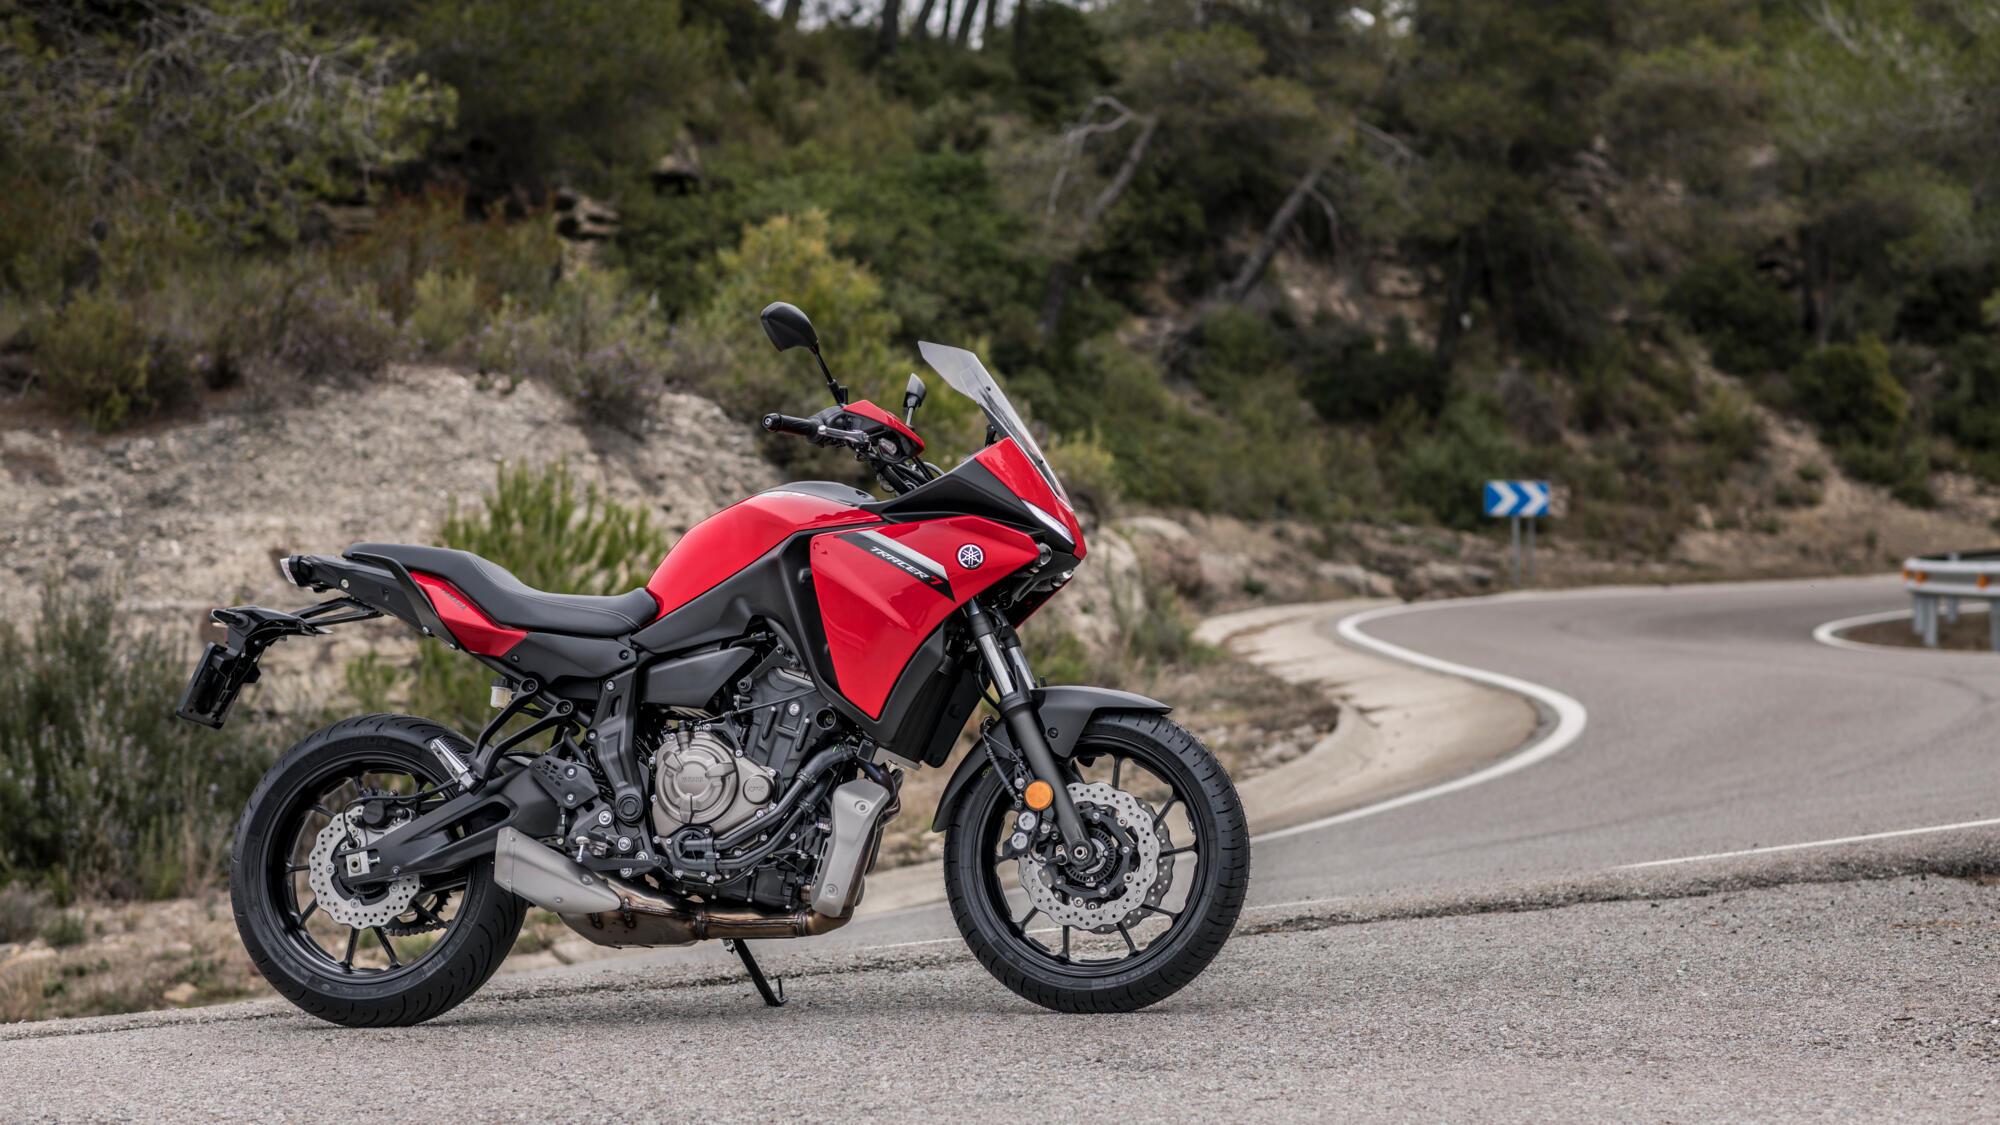 2021-Yamaha-MT07TR-EU-Redline-Static-001-03